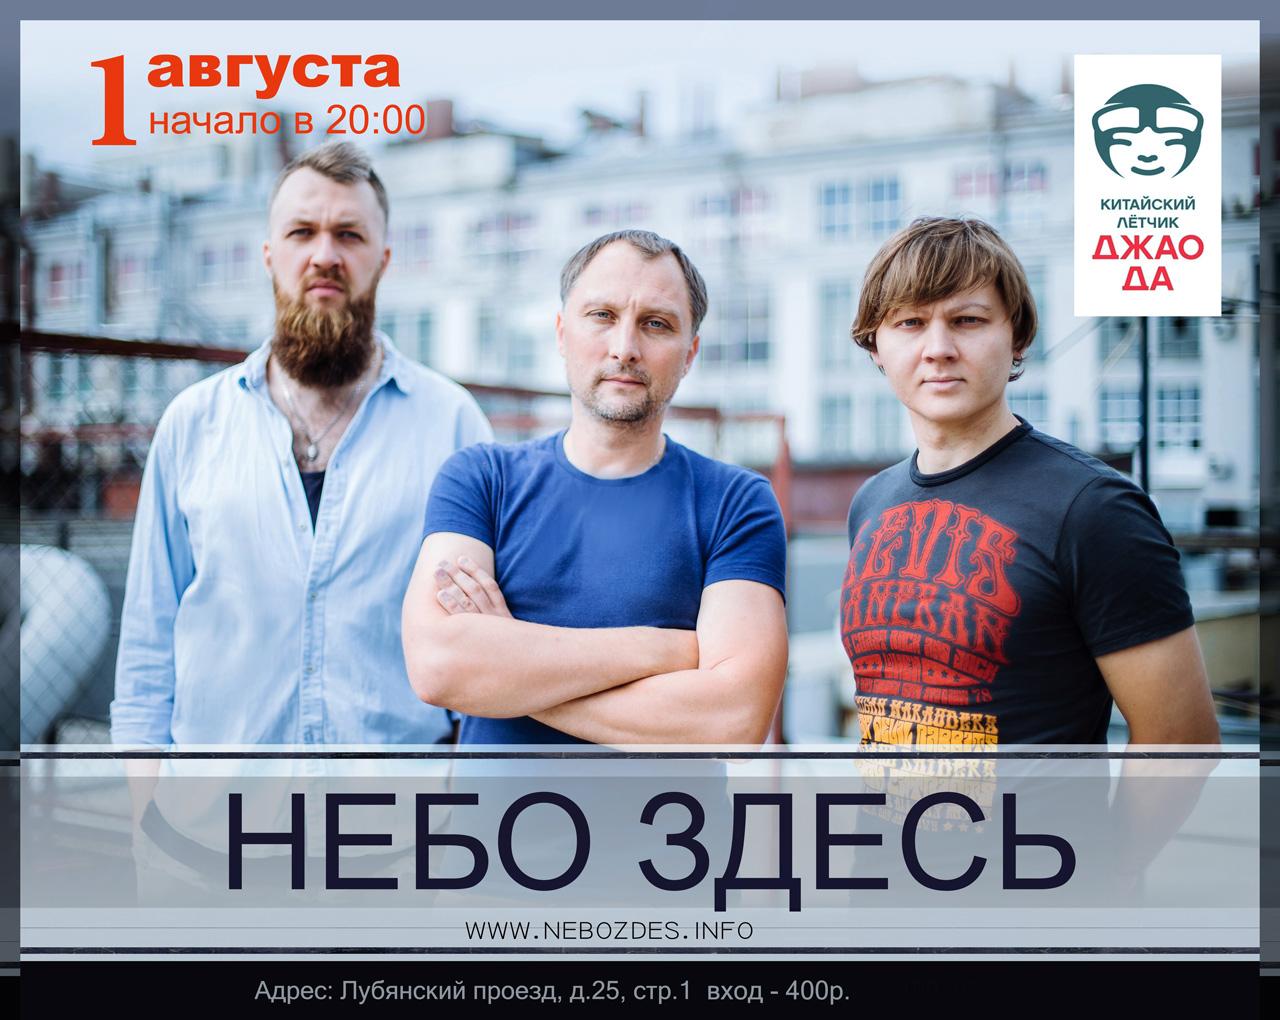 Концерт Небо Здесь 1 августа 2015 года